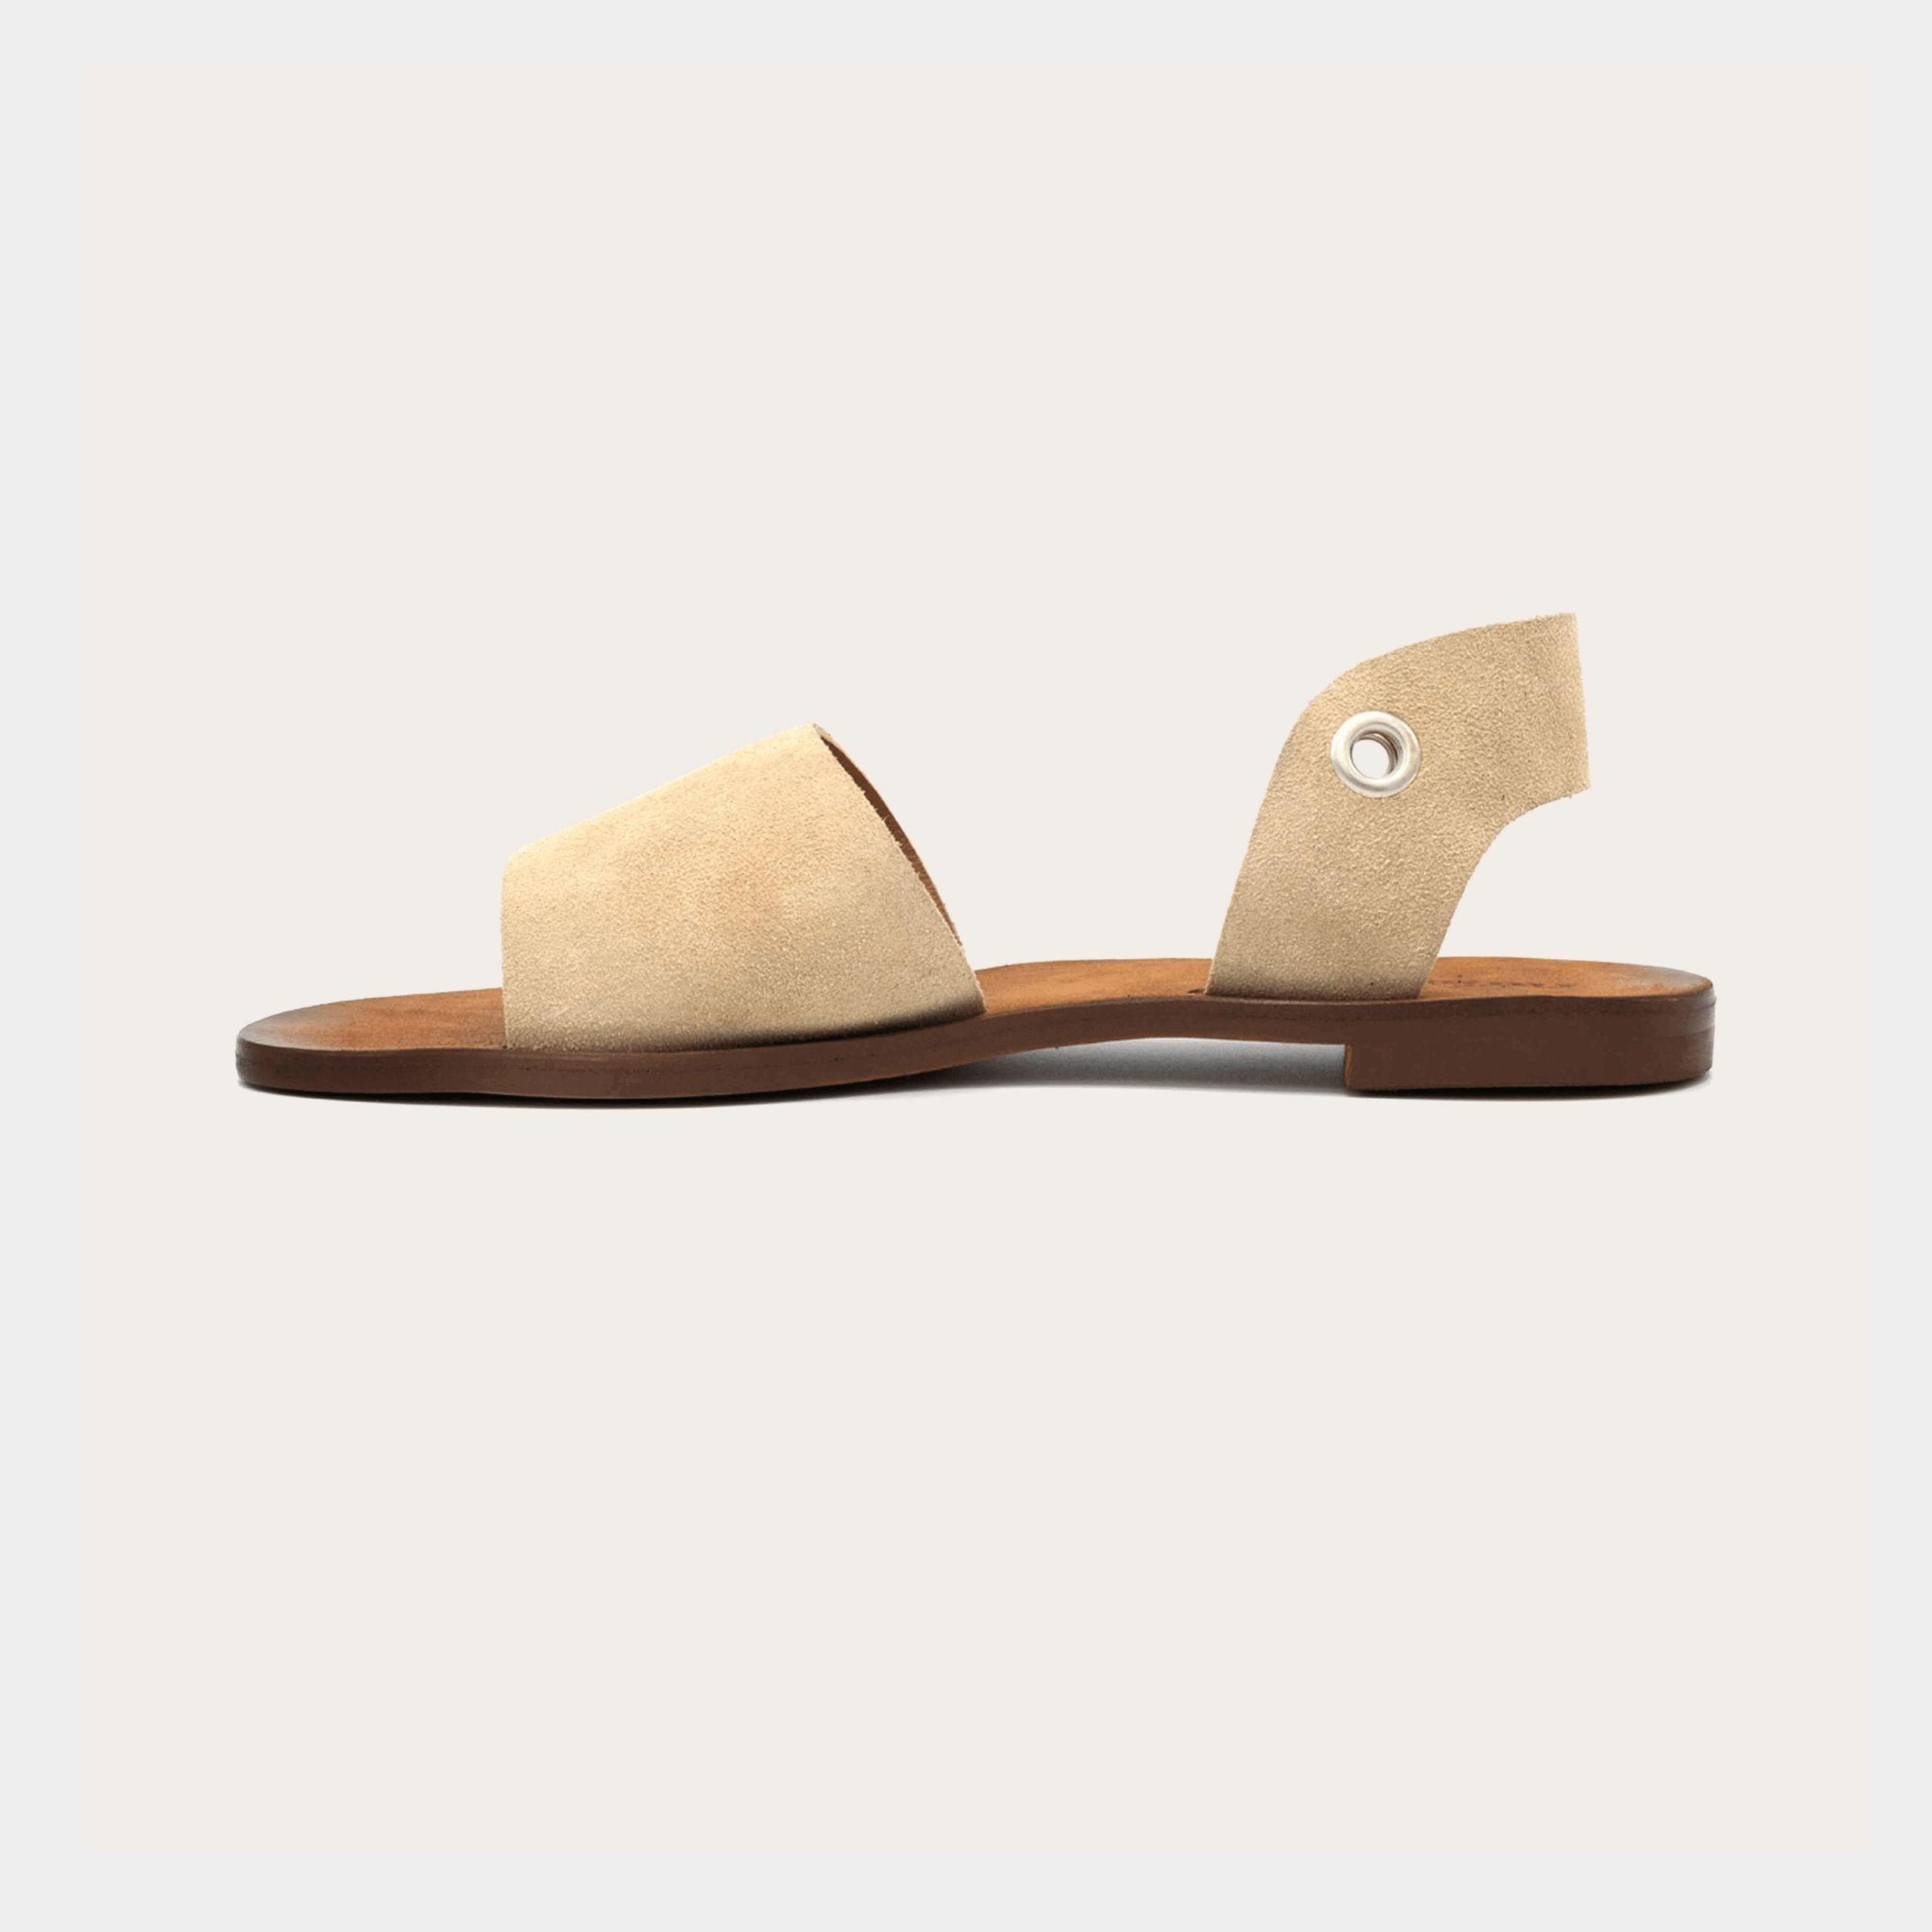 acapulco-beige_2_lintsandalen sandals travelsandals vegan sustainable sandals wikkelsandalen